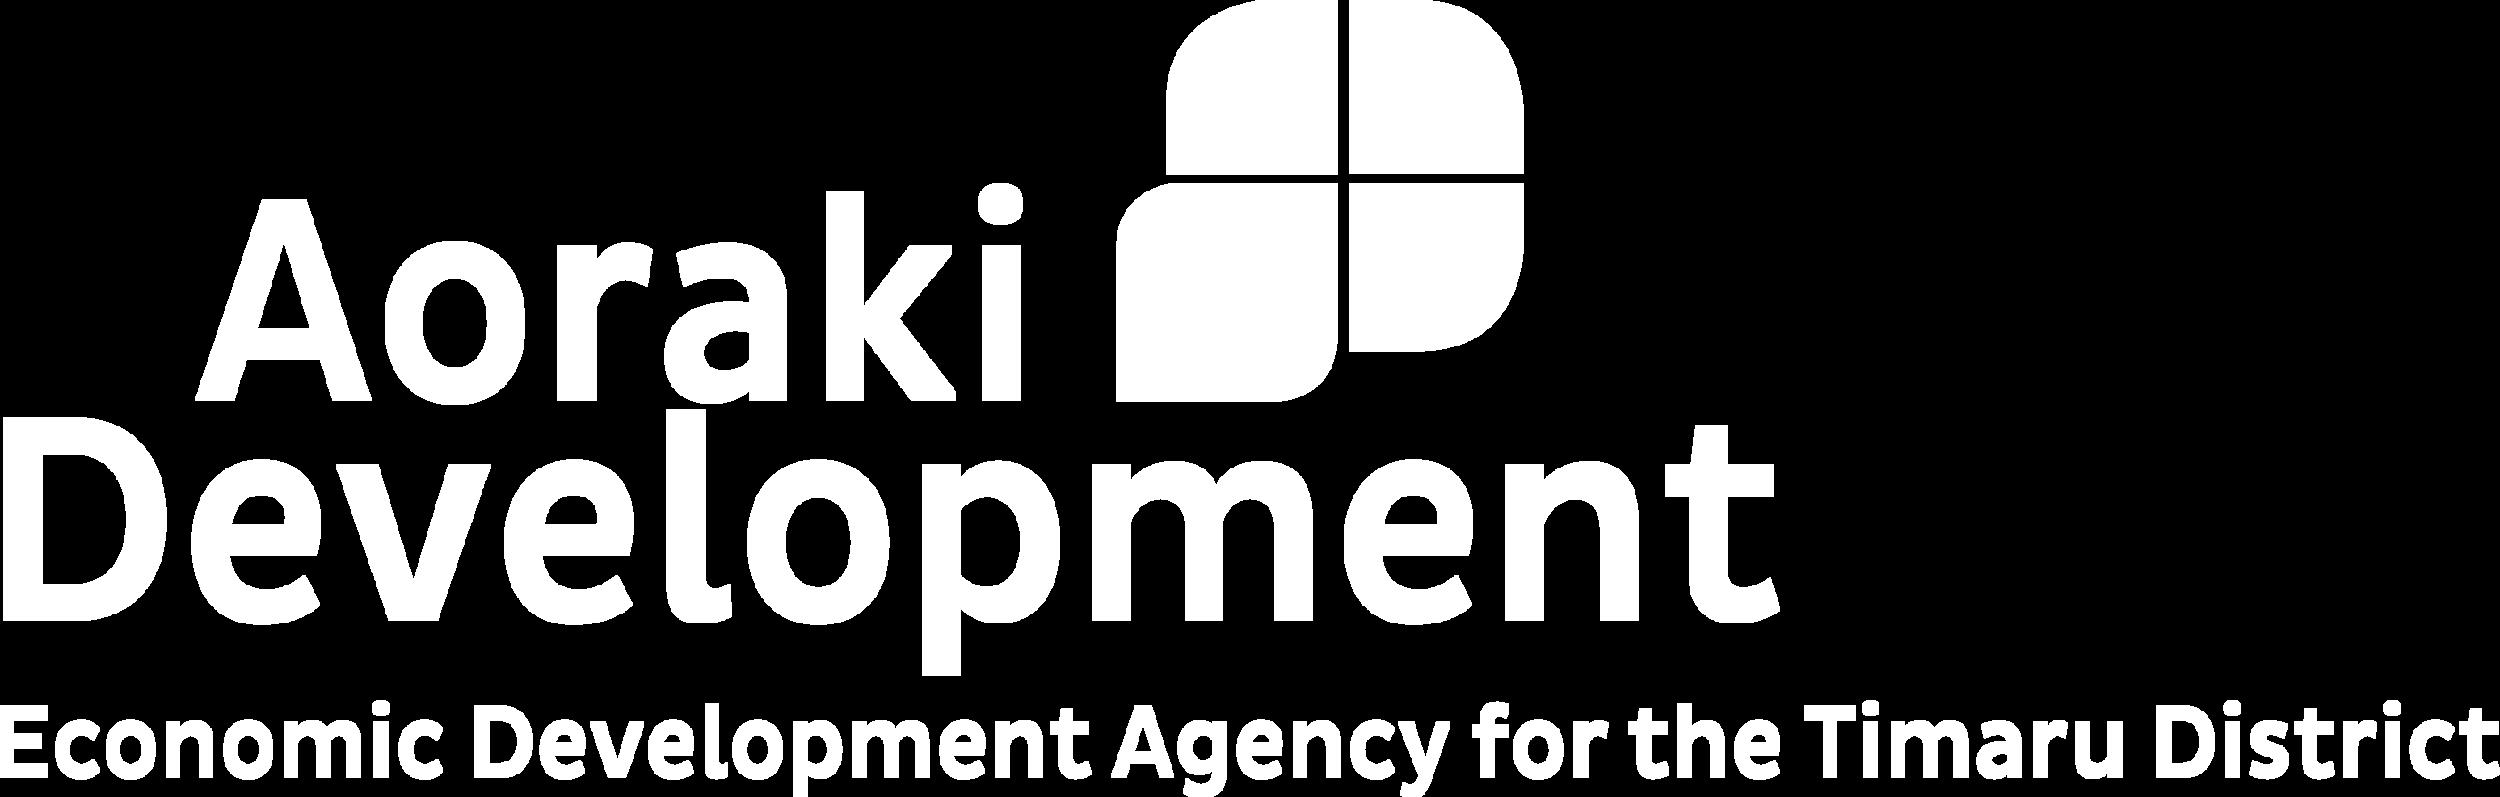 AD- Aoraki Development Economic-Logo white, economic development agency words.png